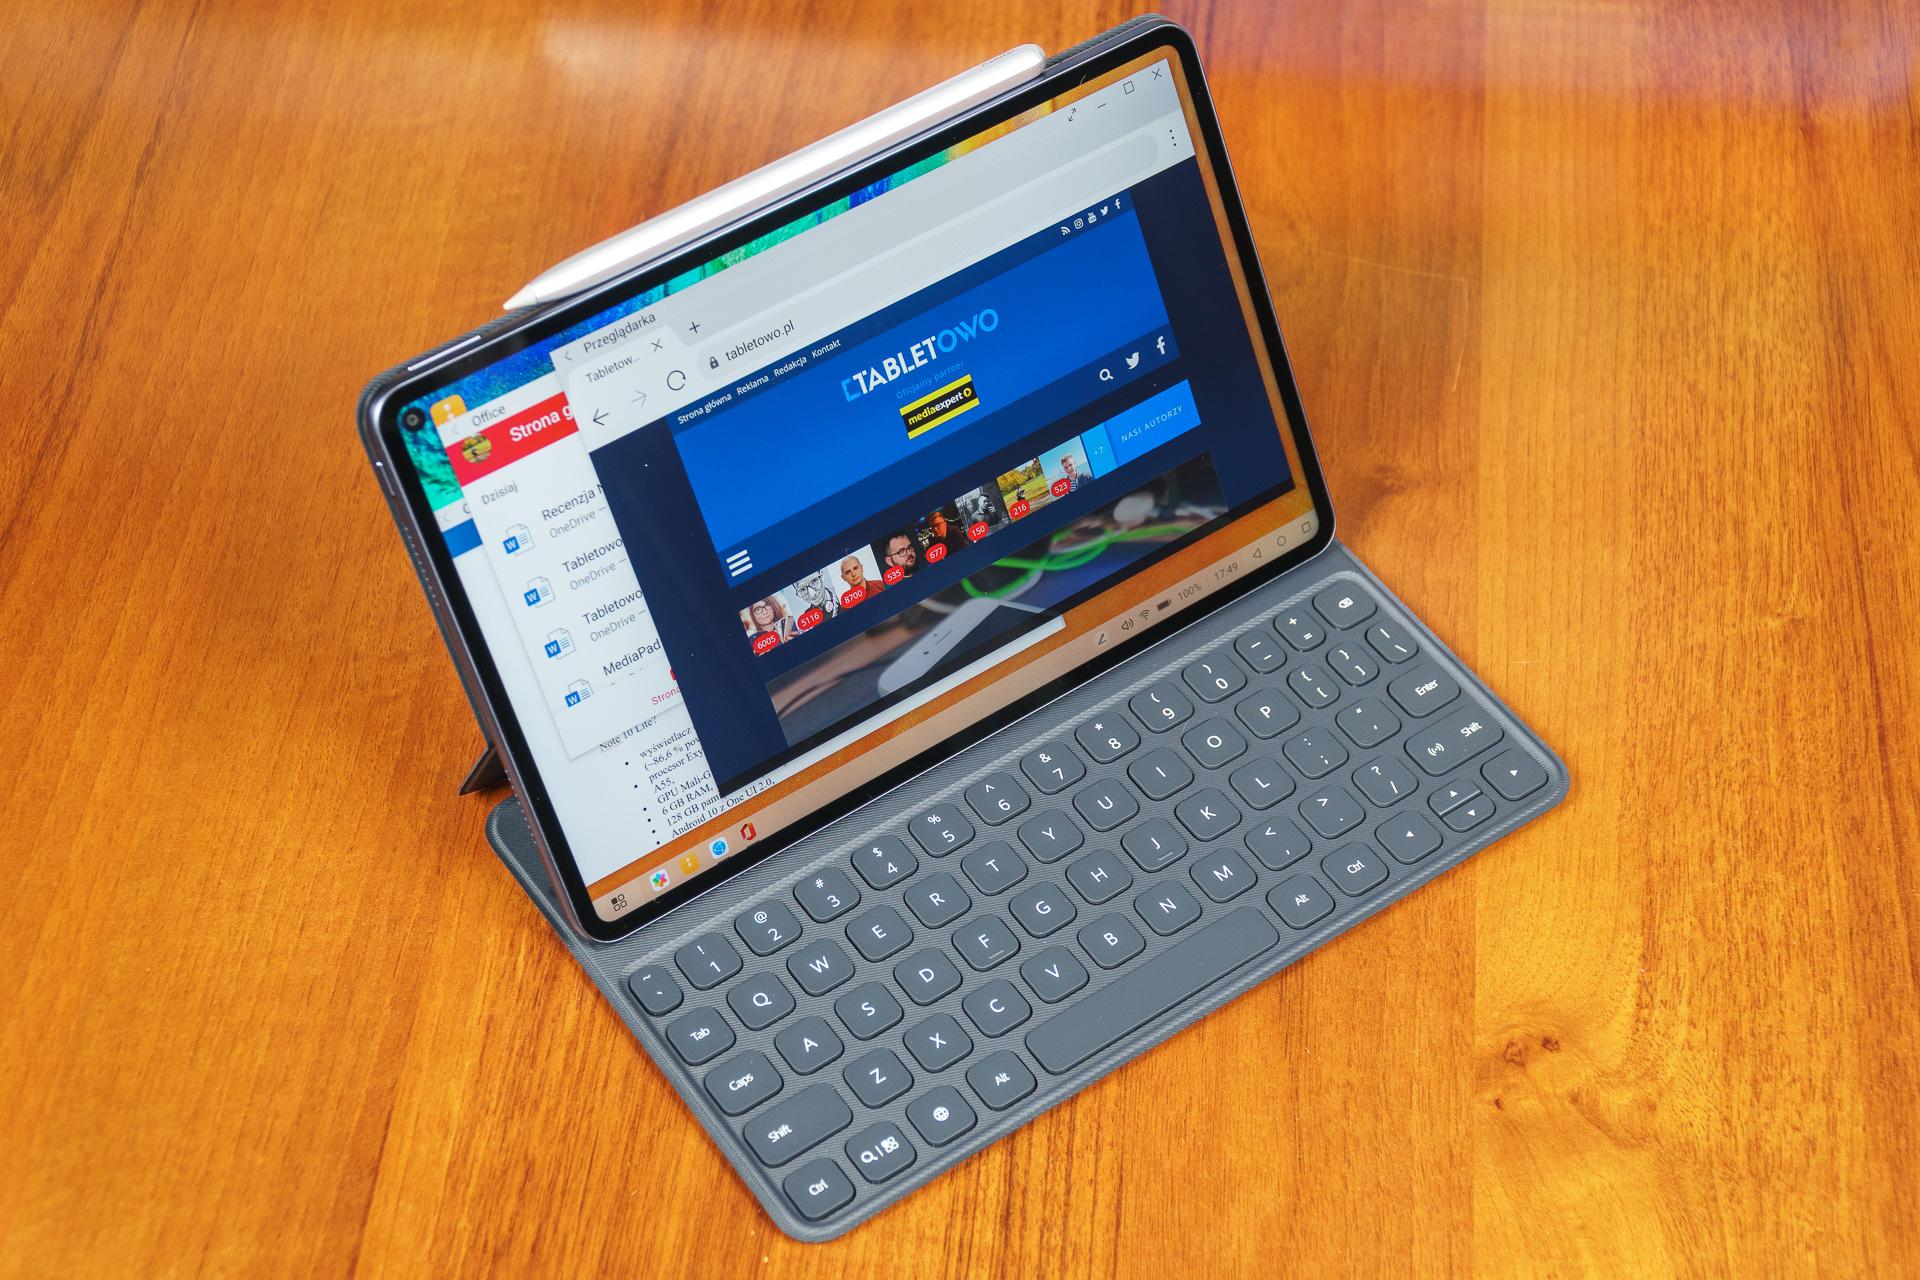 Recenzja tabletu Huawei MatePad Pro. Tak blisko, a tak daleko 26